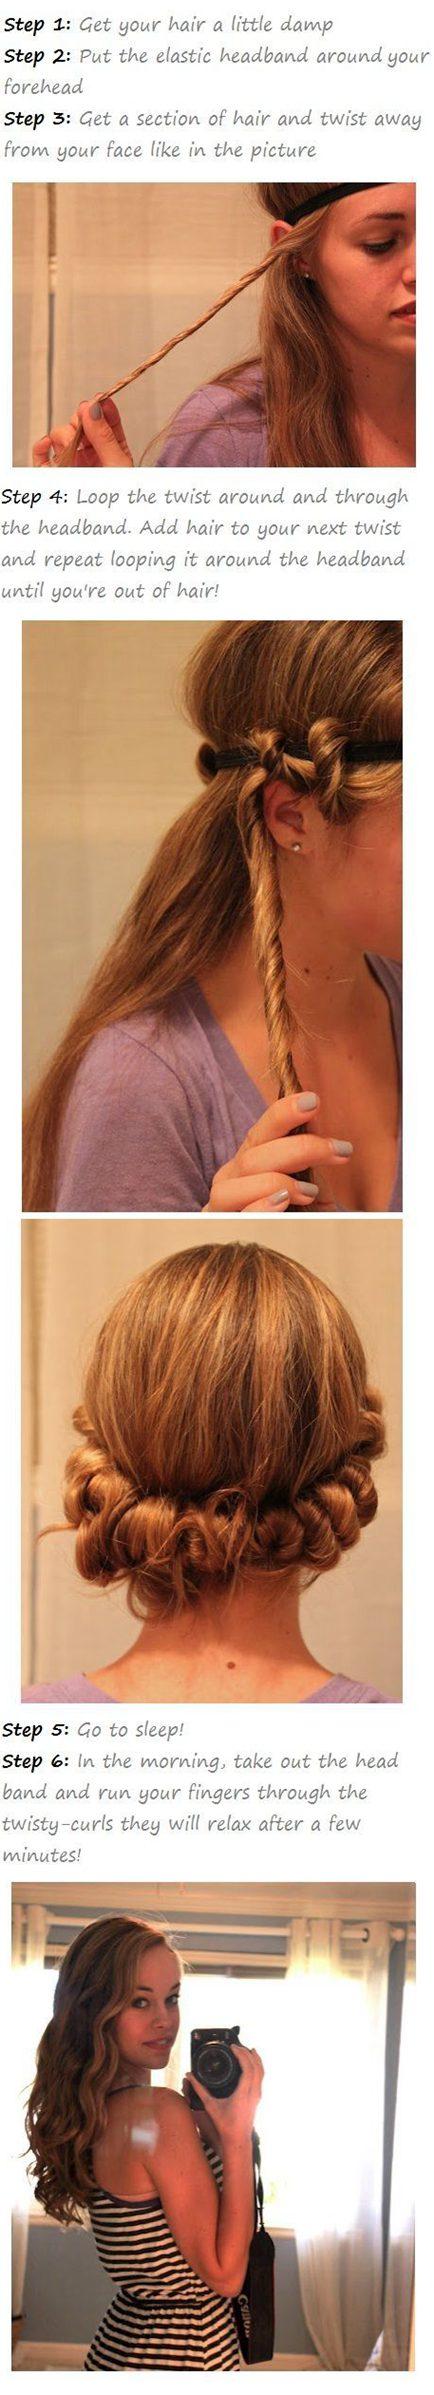 Hair tutorials hair style tutorials styles pinterest hair